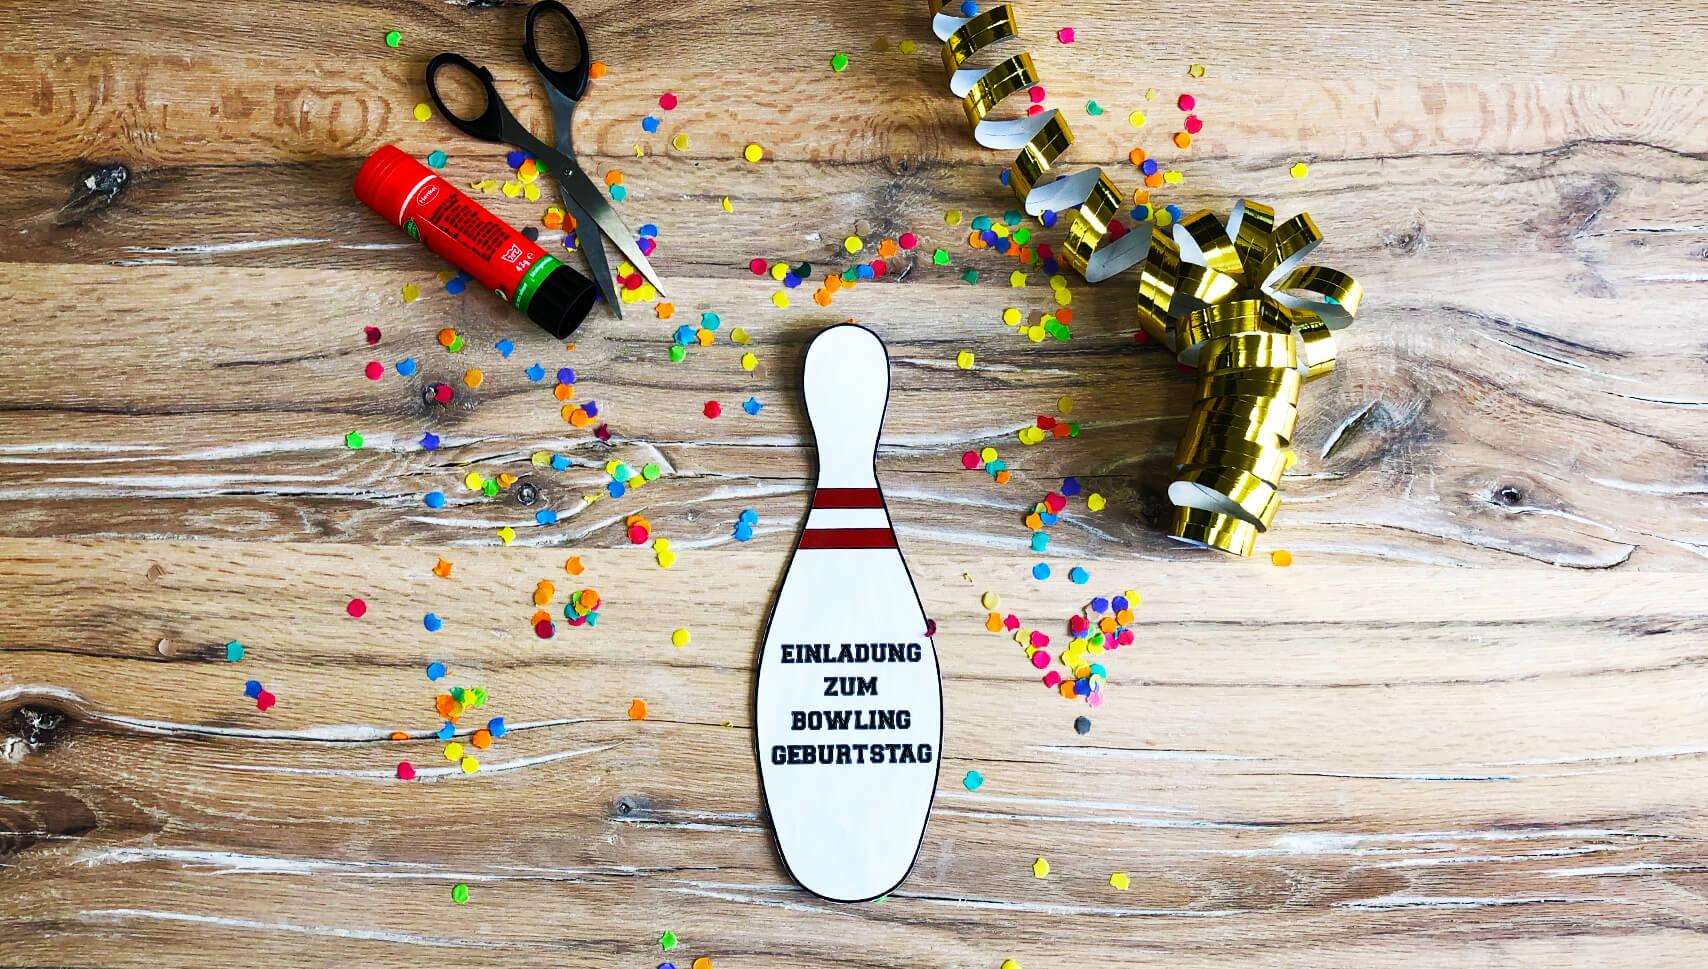 Kindergeburtstag-Bowling-Einladung-Bowlingpins